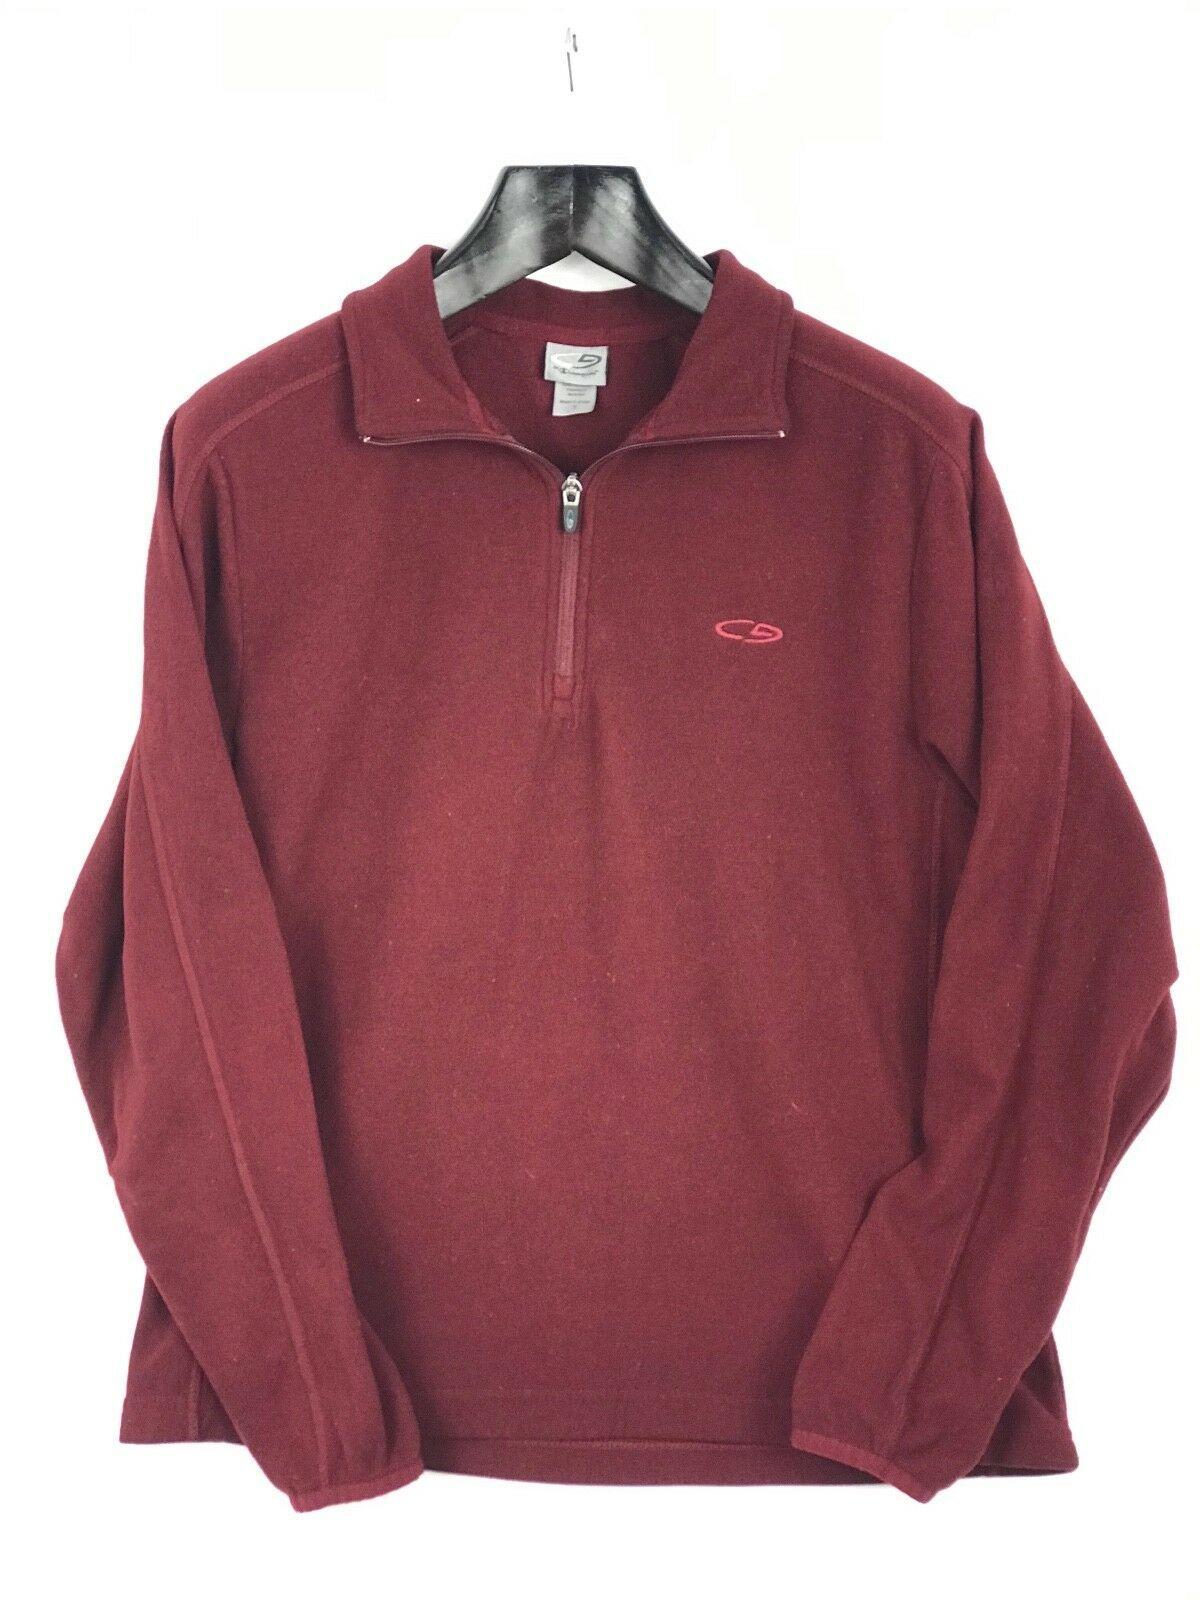 Champion Men Pullover Sweatshirt Fuzzy 3/4 Zip Long Sleeve Athletic Size S